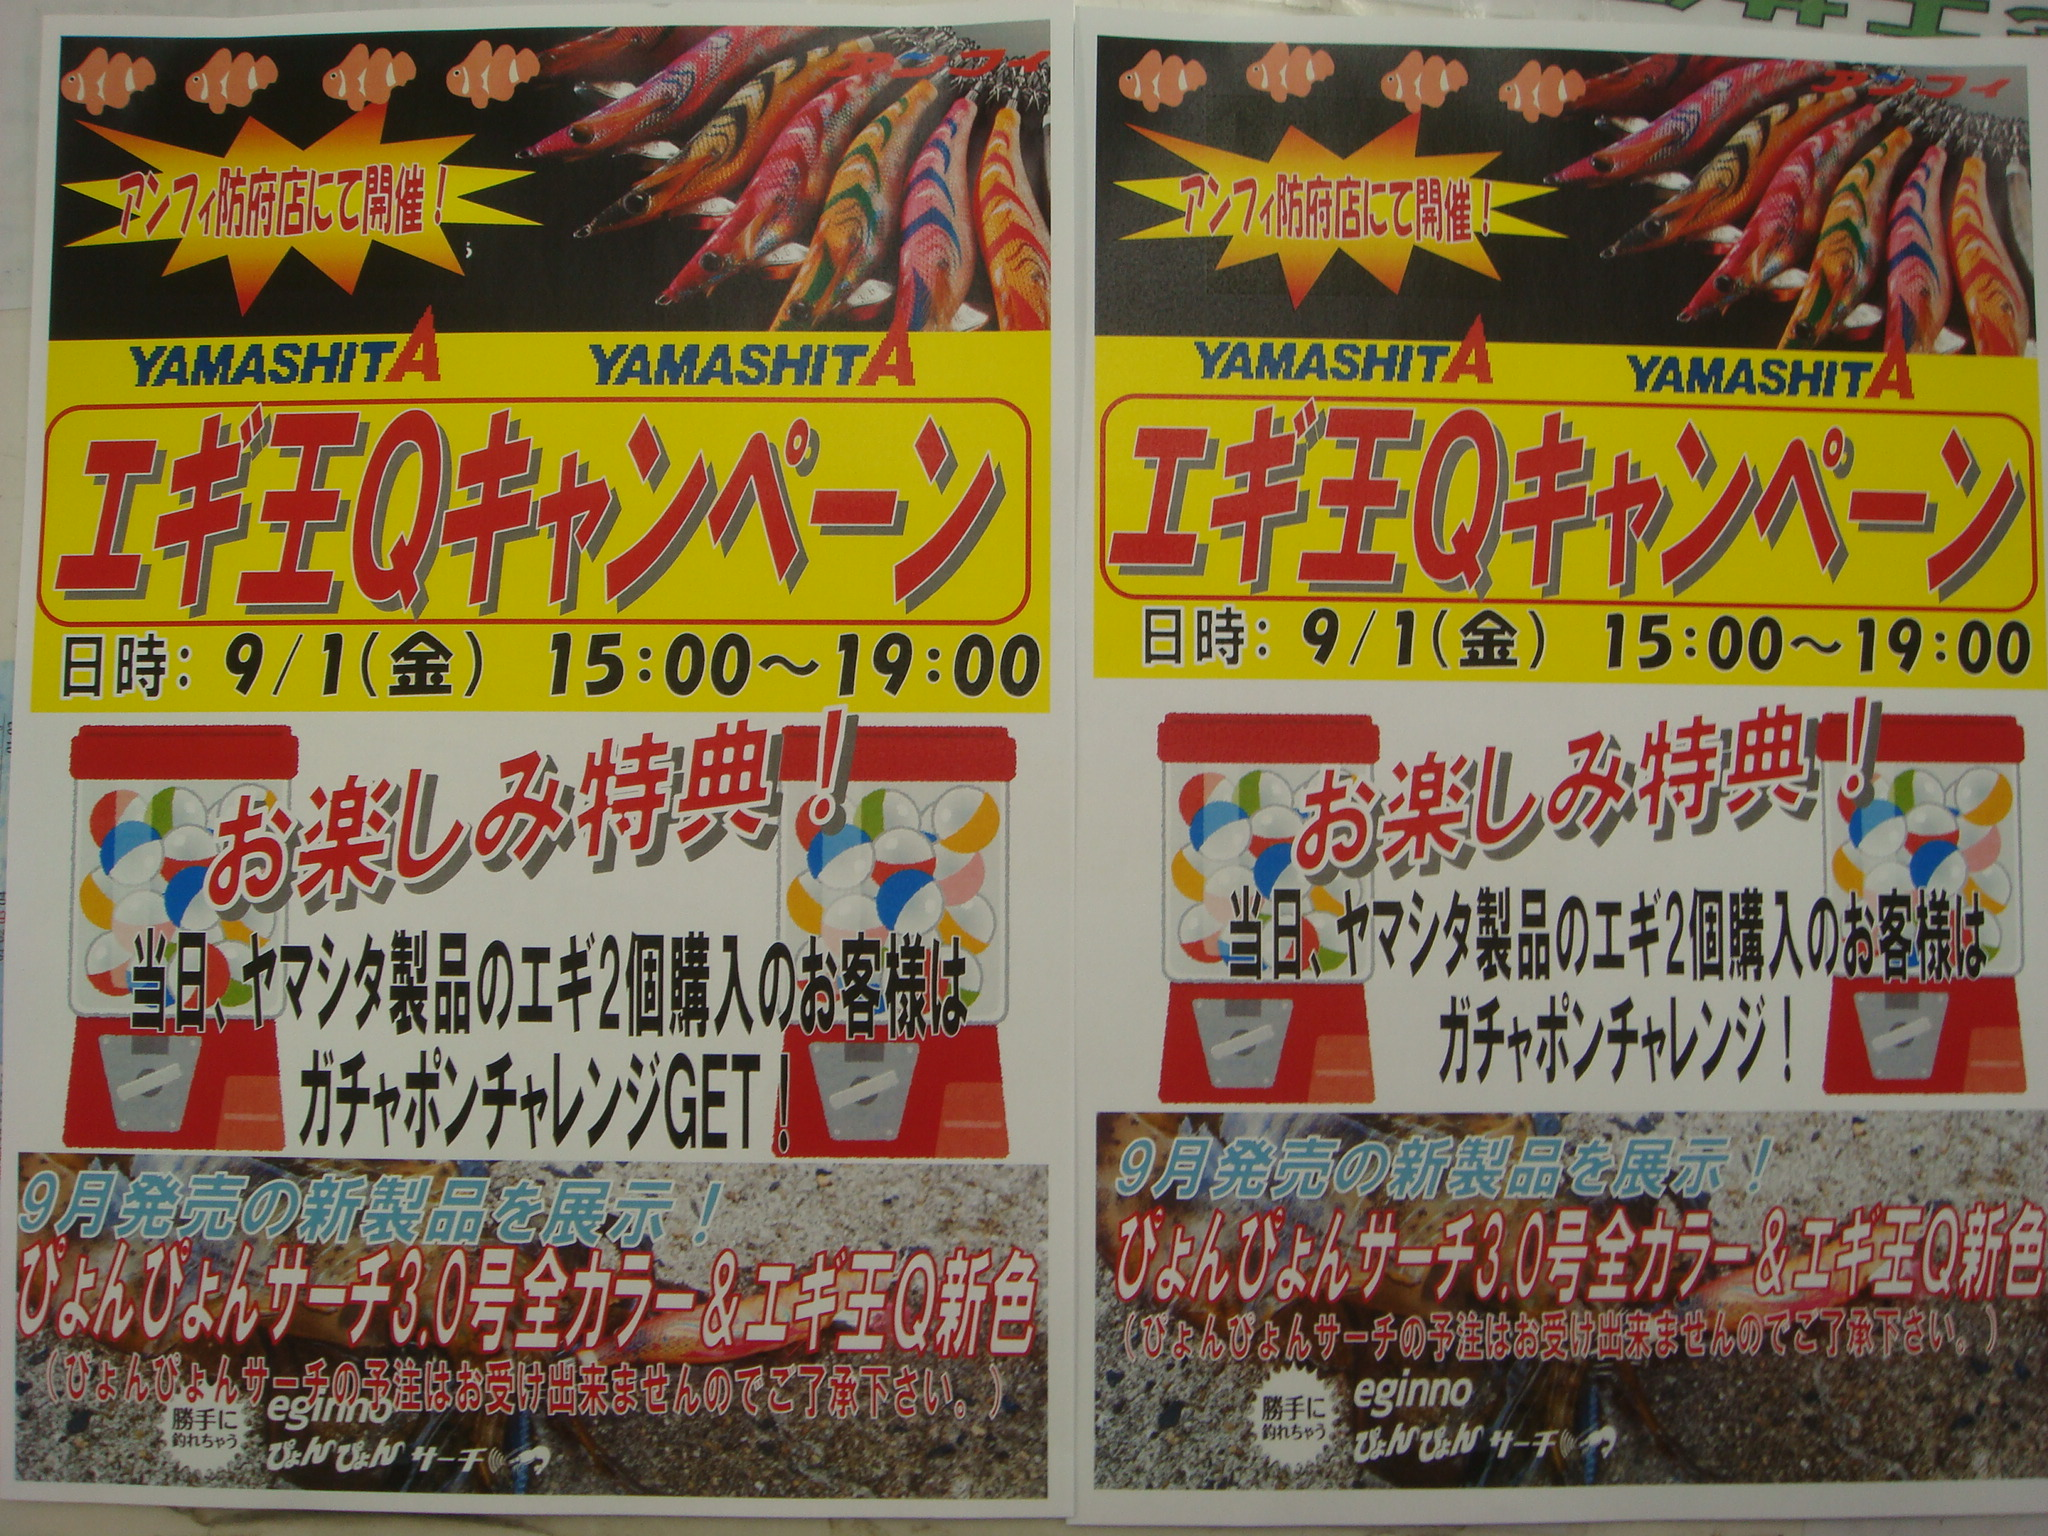 http://www.e-angle.co.jp/shop/news/DSC02127.JPG